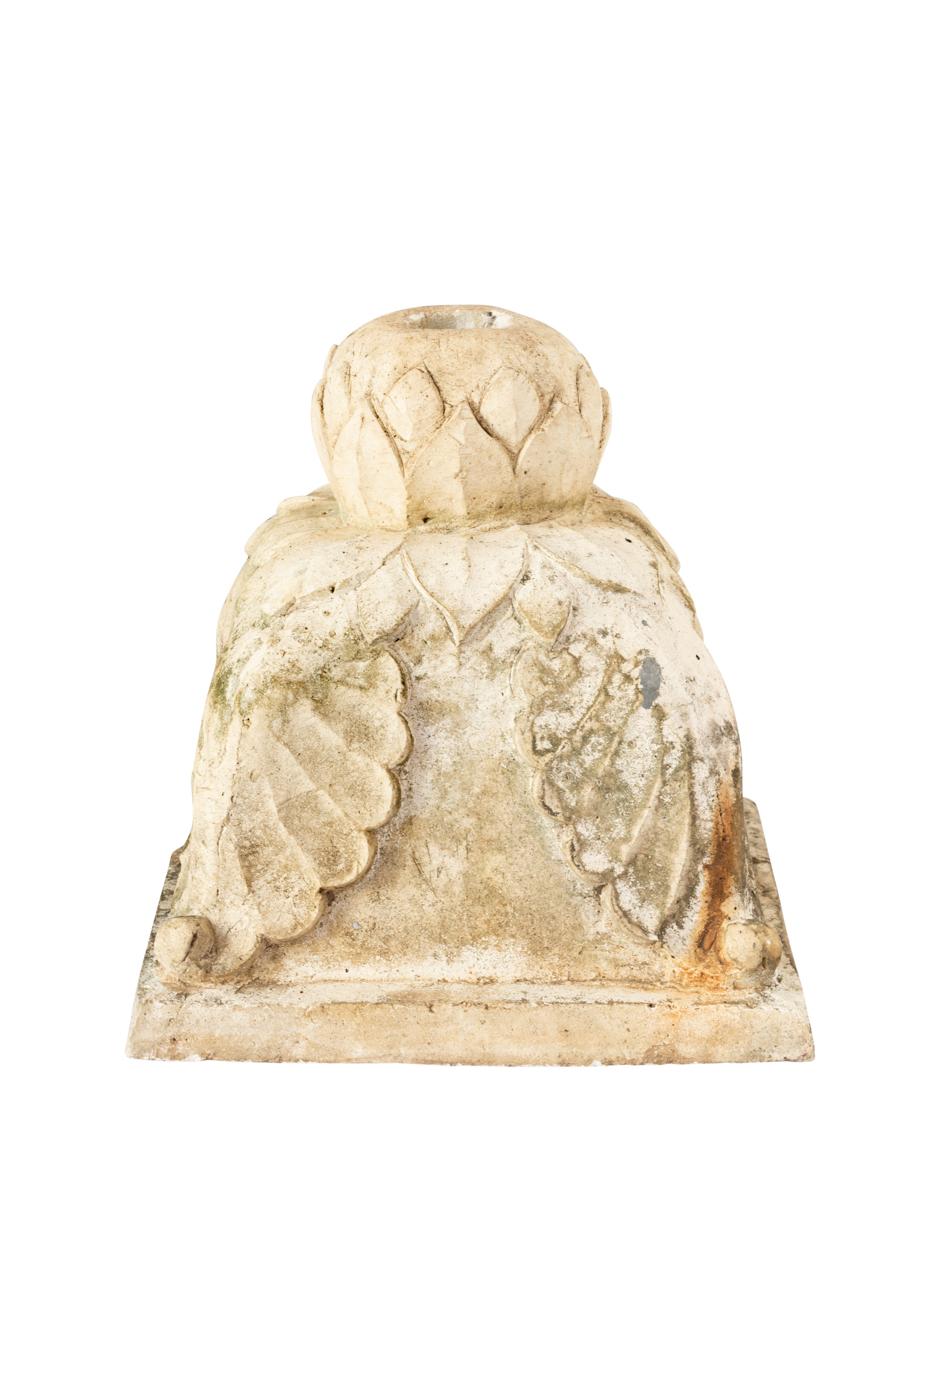 Umbrella stand in natural stone